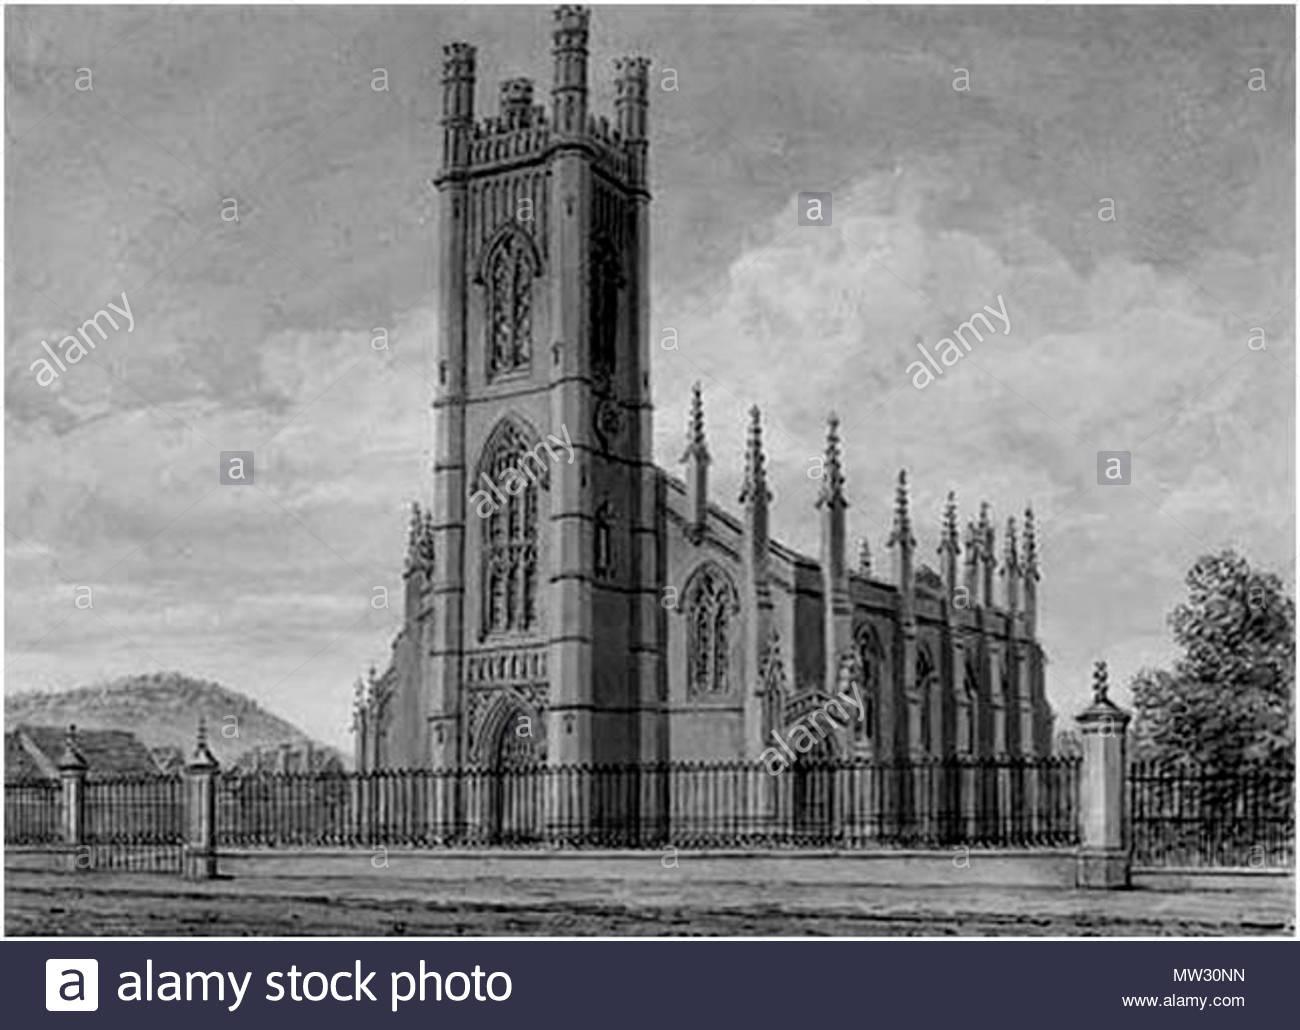 . English: Holy Trinity church Burton Upon Trent Staffordshire England. 3 October 2009. N S Aspdin 282 Holy Trinity Church Burton on Trent - Stock Image